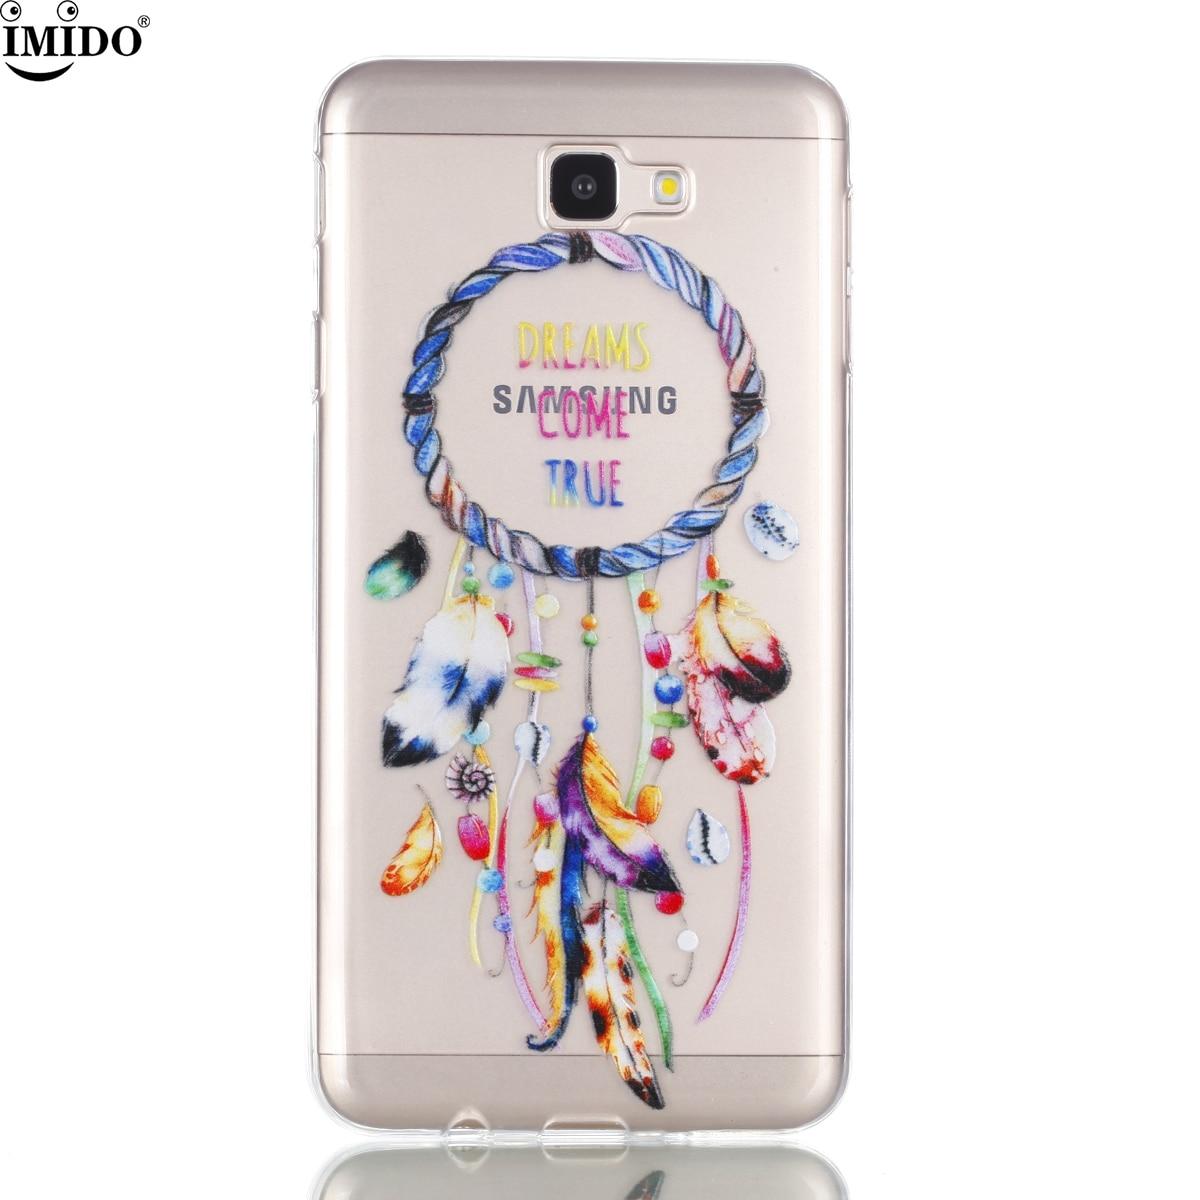 For Coque Samsung Galaxy J7prime Case Samsung J7prime phone Case Samsung J7 prime Cover SM-G610F G610M/DS G610L/K/S/Y 5.5